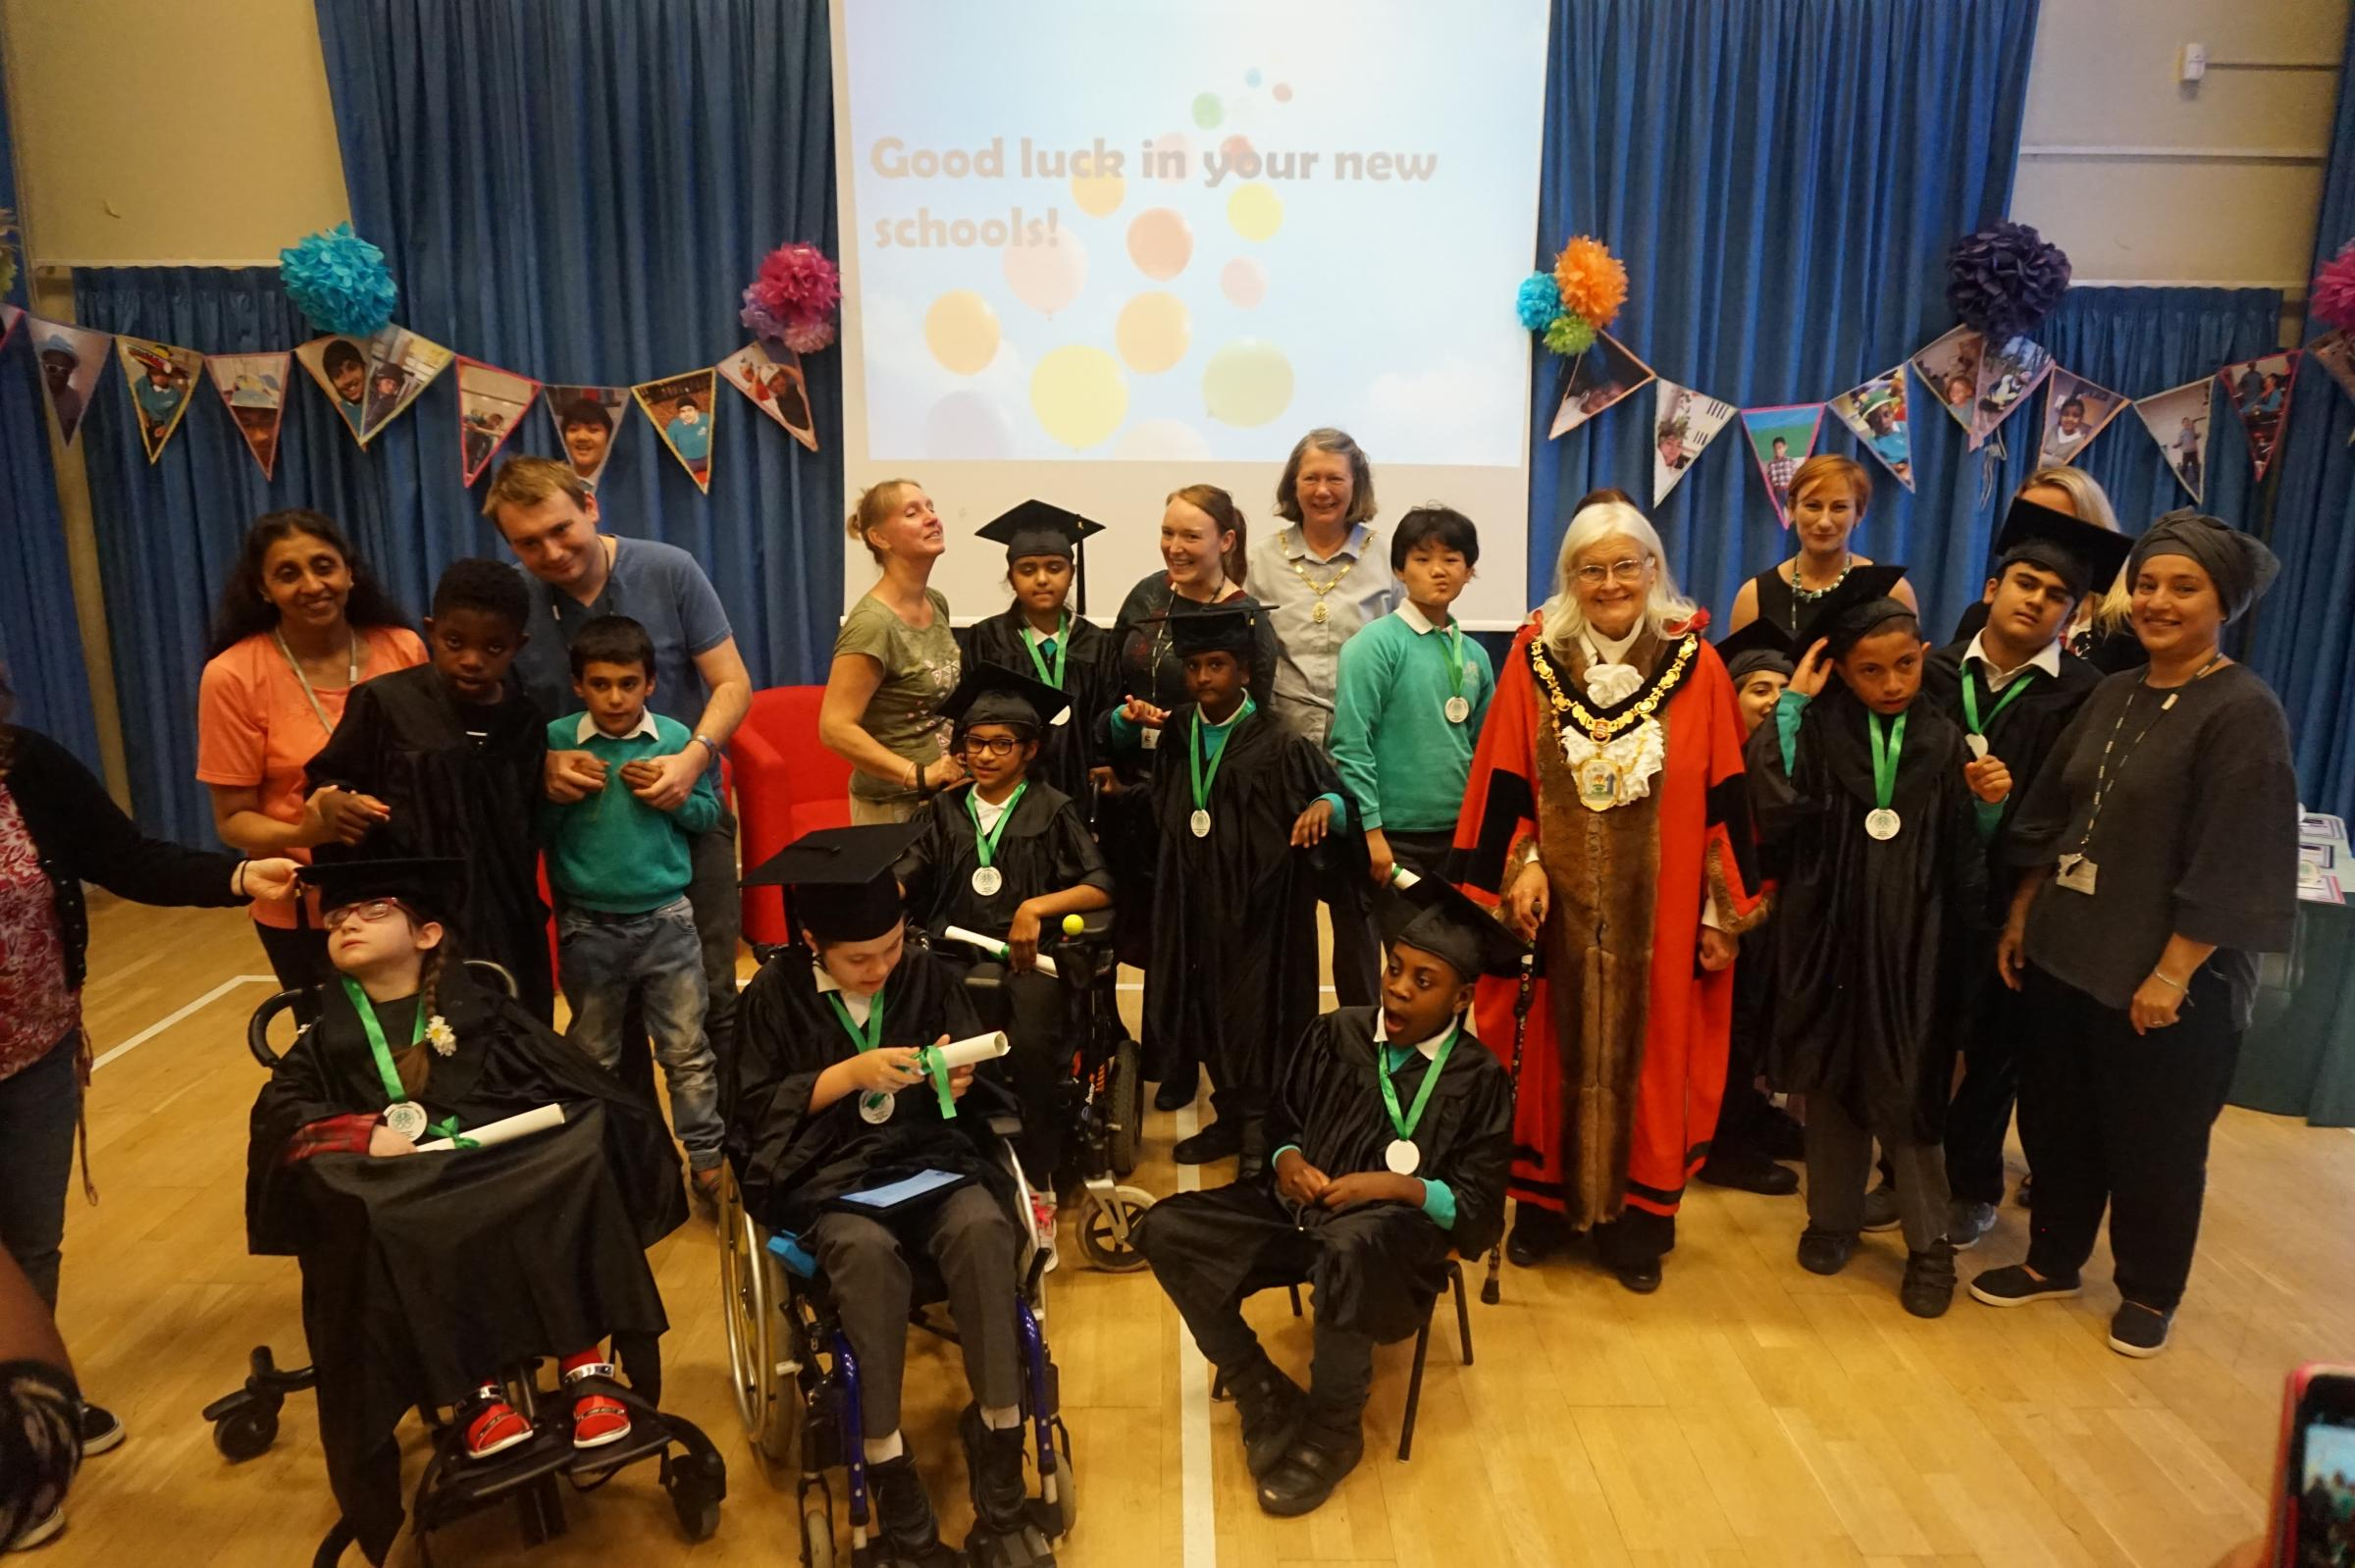 Special needs pupils from Woodlands School, Edgware graduate